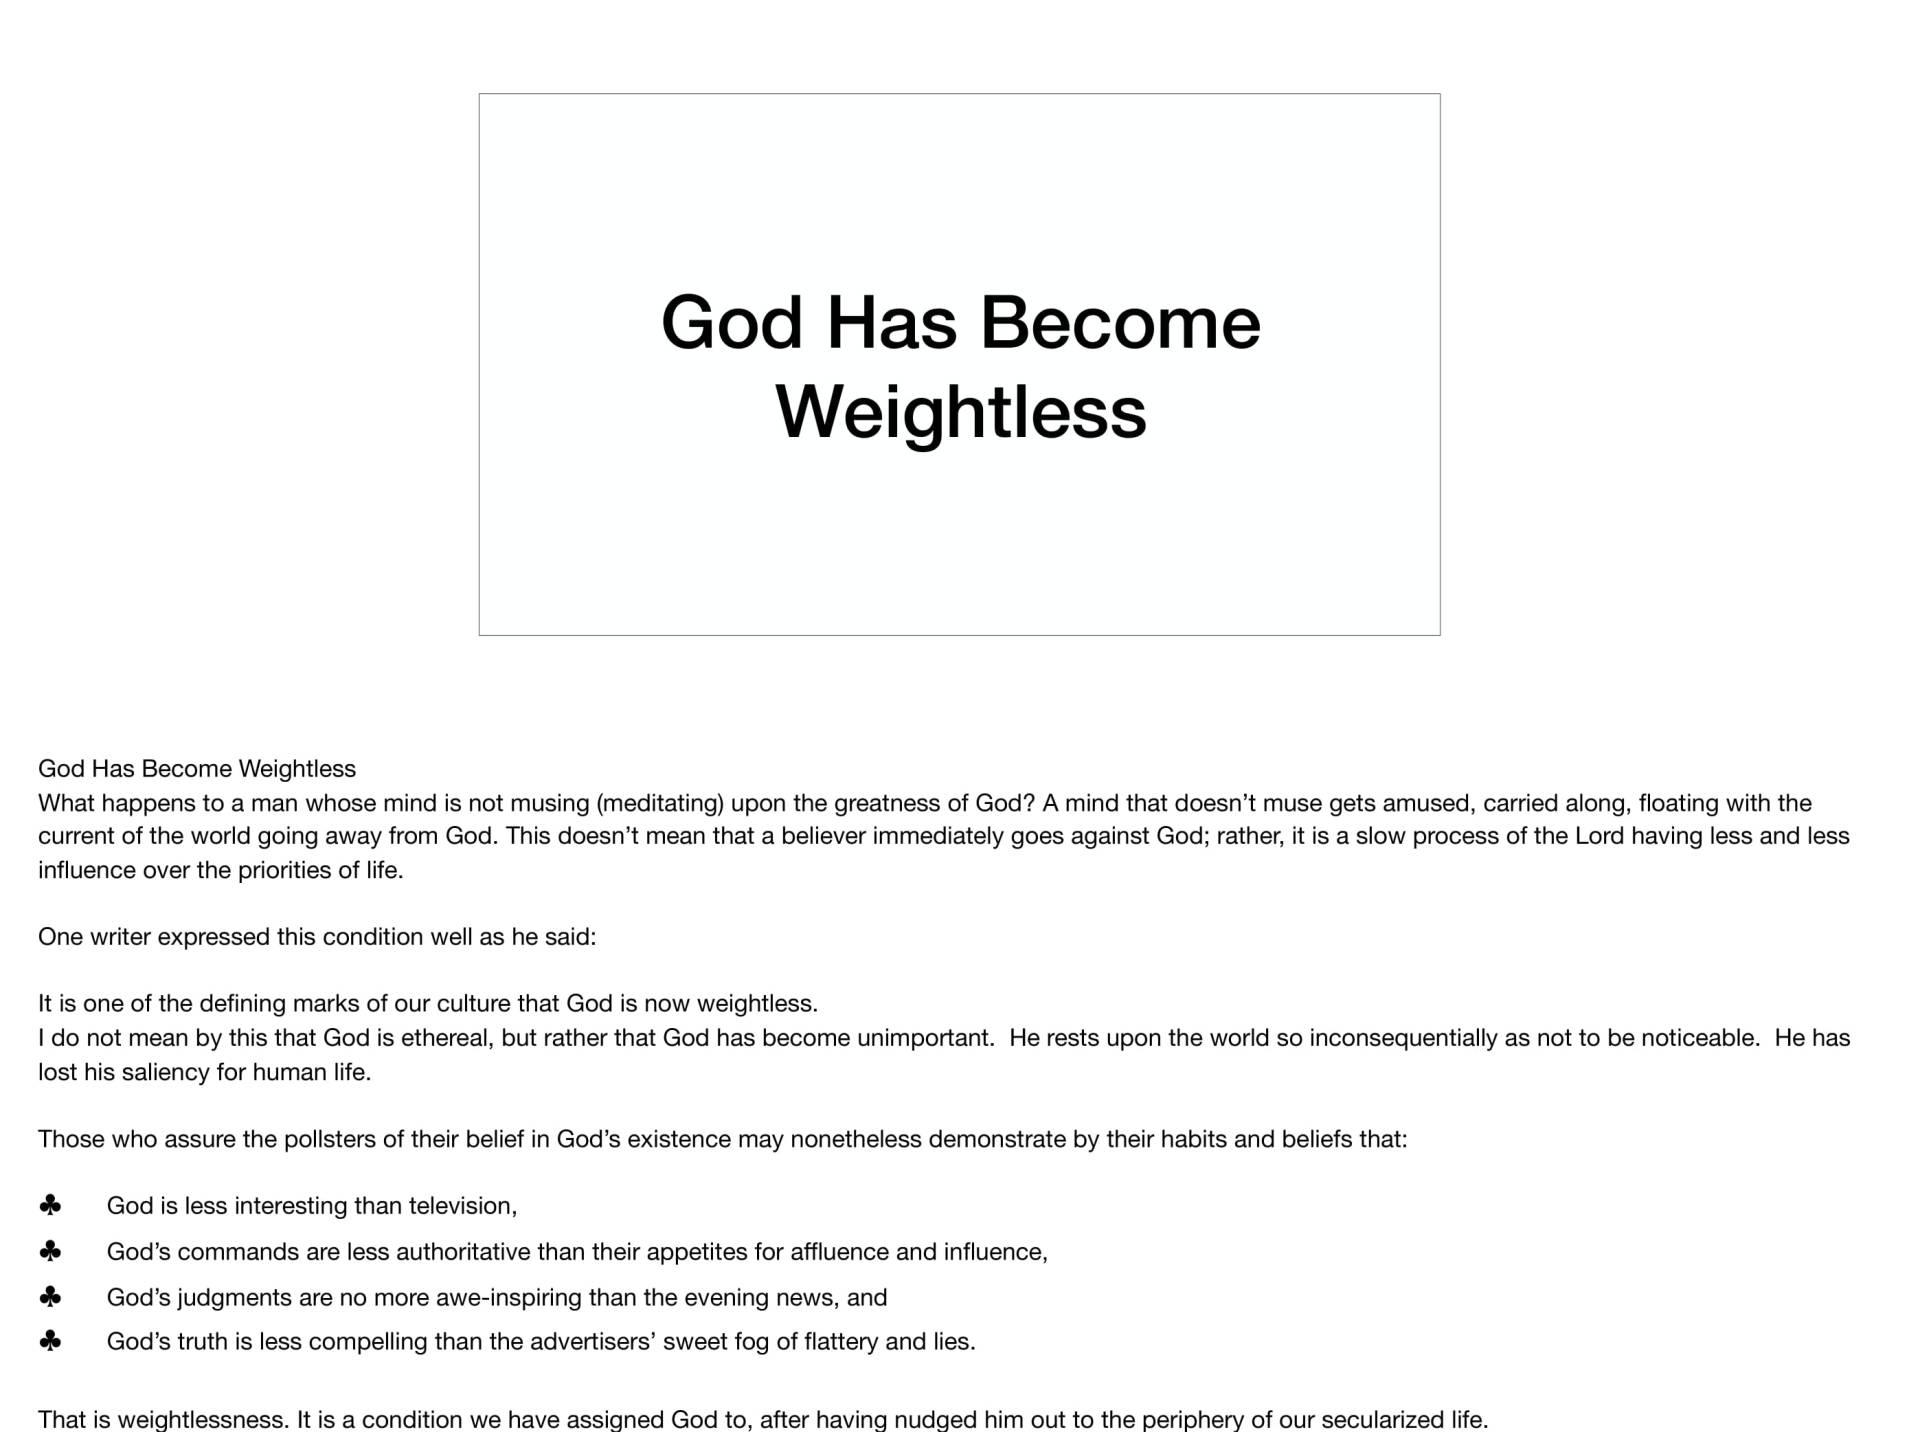 LGI-02 - Men & Husbands Beware Of Weightlessness-17